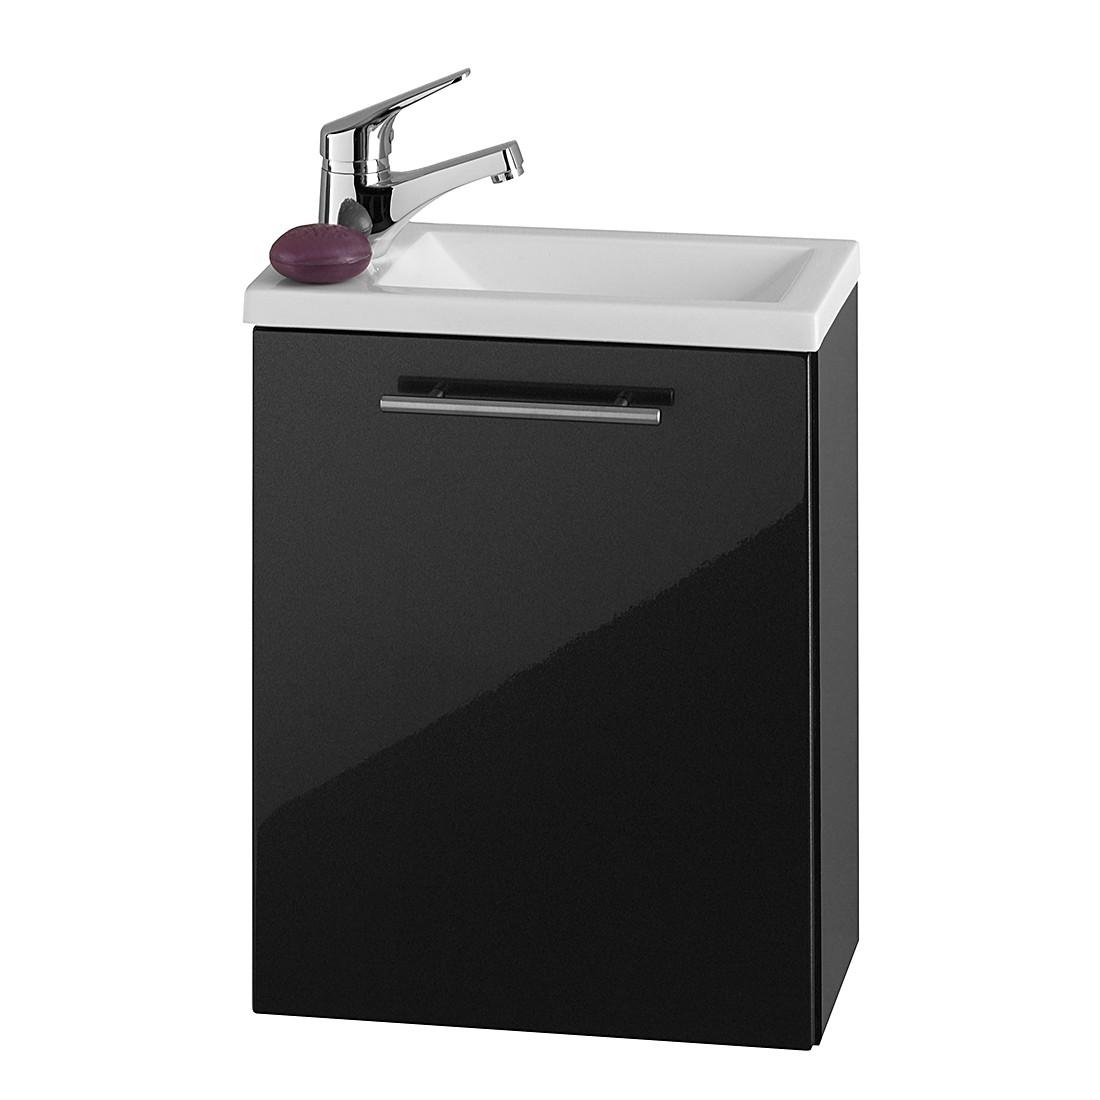 Handwaschplatz Alvaro hgl.-Front – Anthrazit, Aqua Suite jetzt bestellen